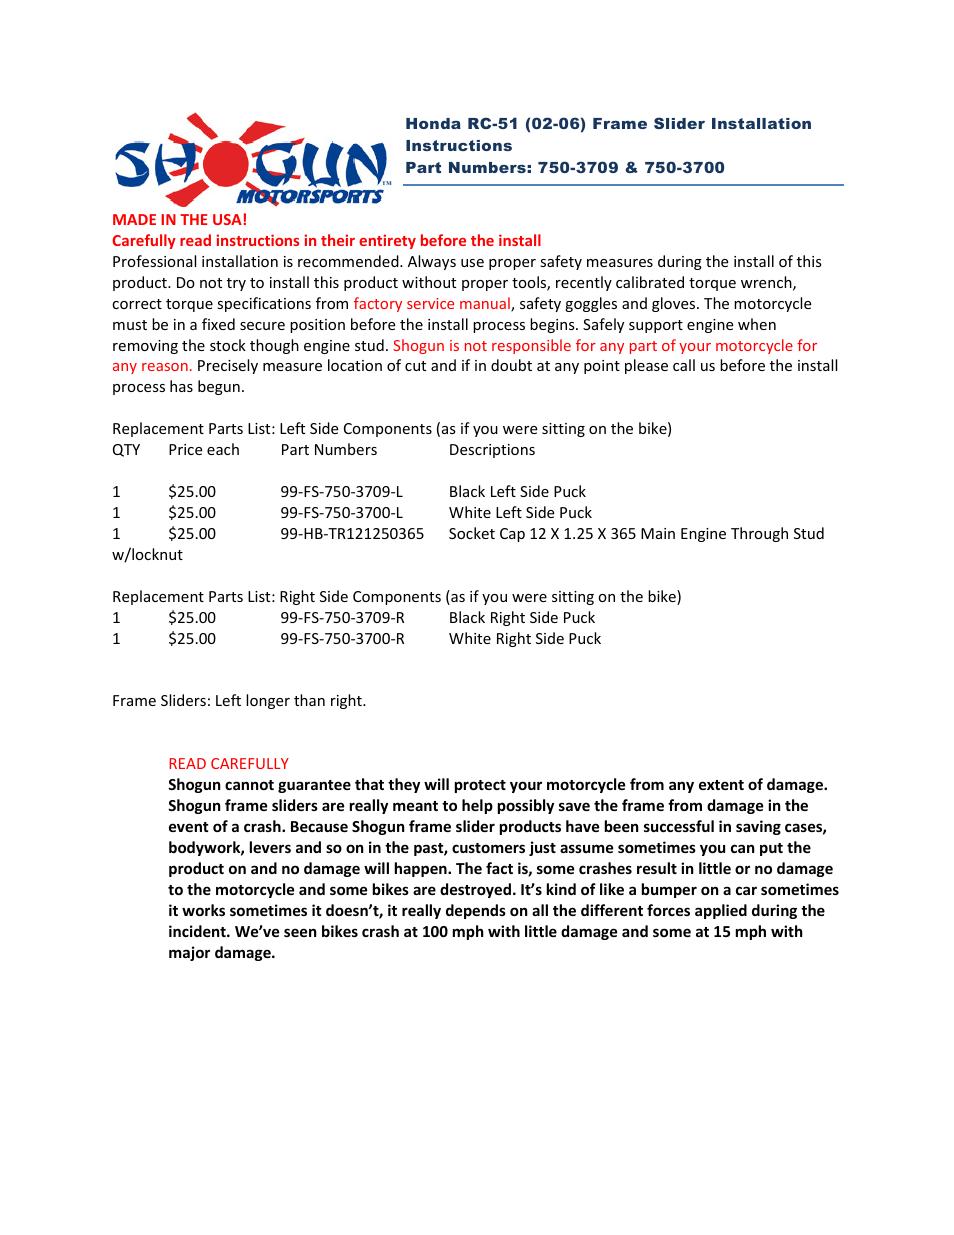 Shogun Motorsports Honda RC-51 (02-06) Frame Slider User Manual | 1 page